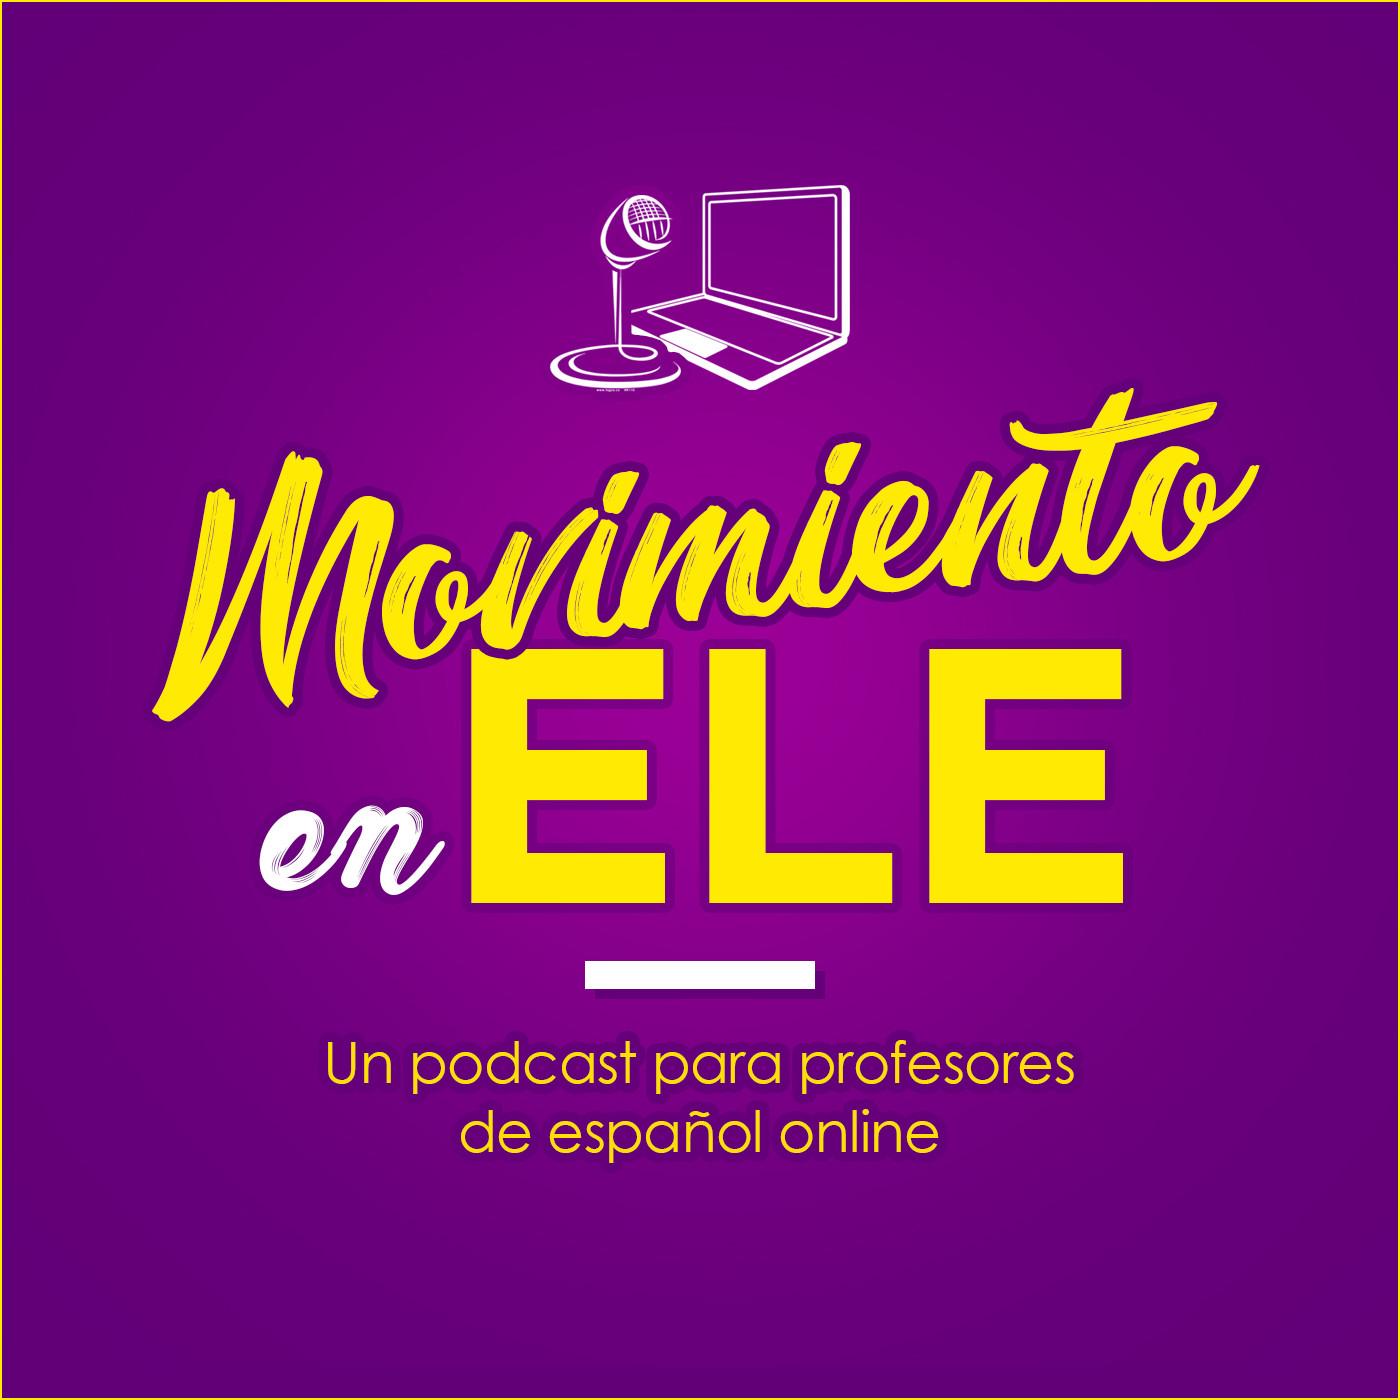 Desarrollo SpanishCalls